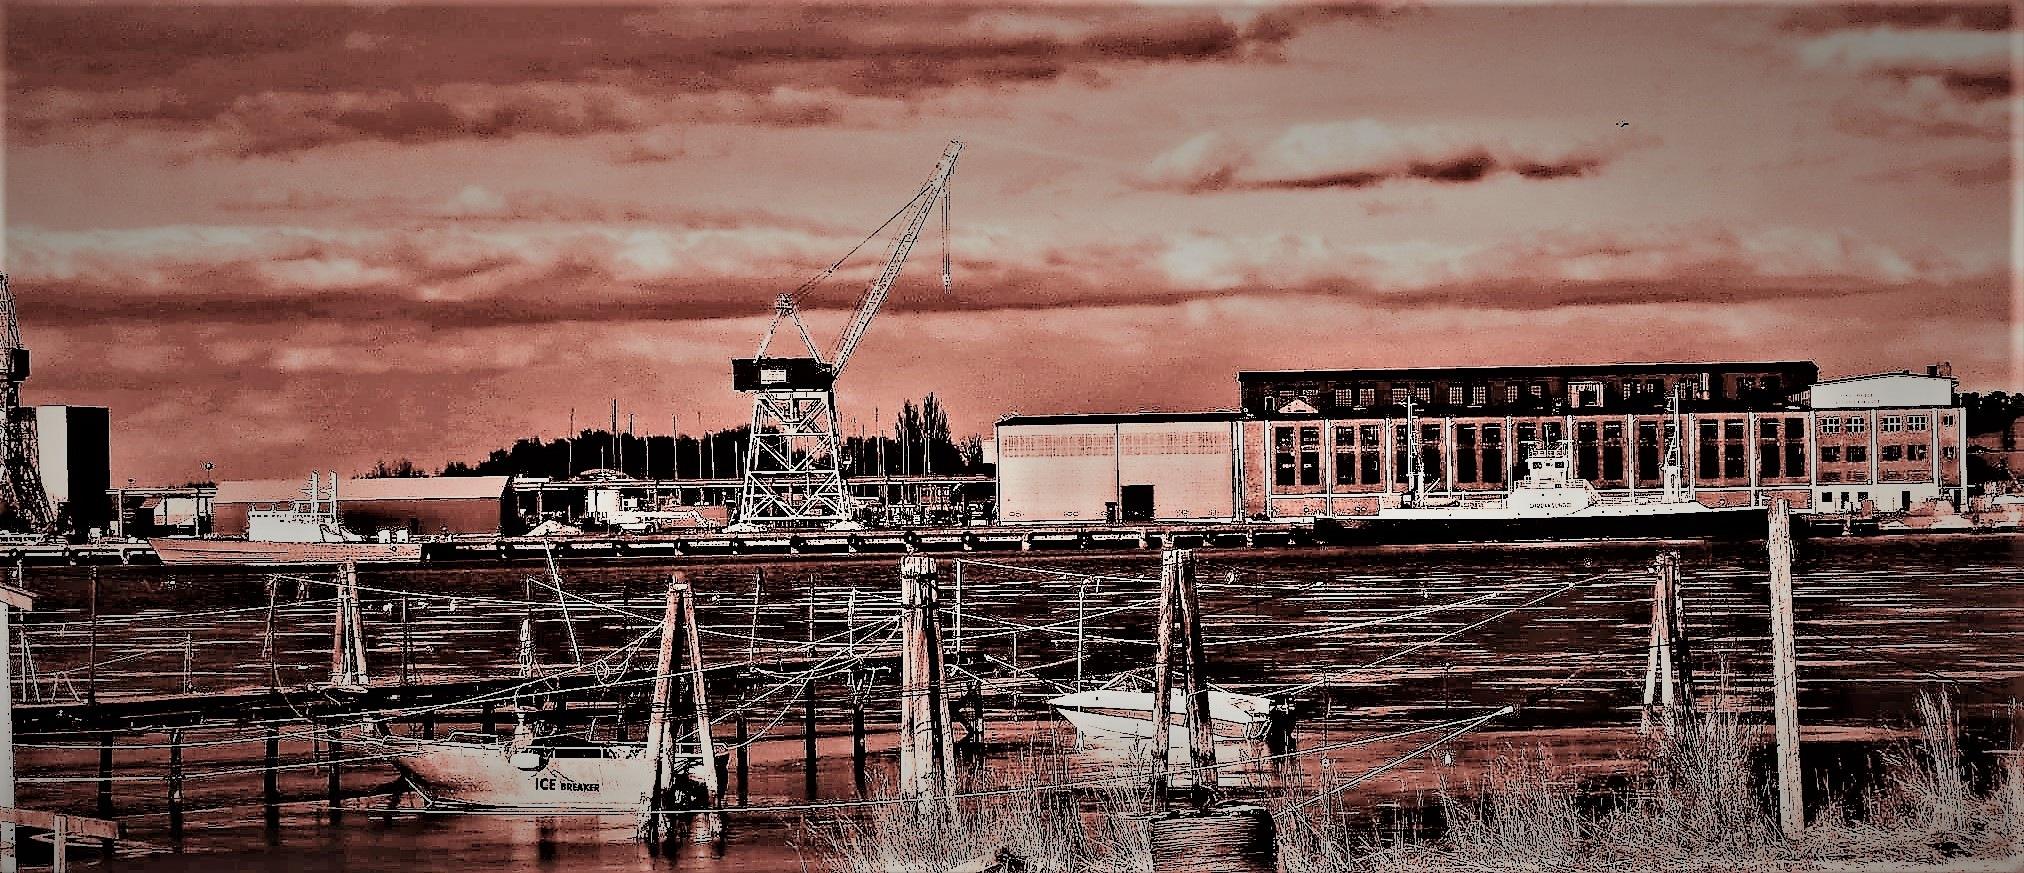 Untitled by dag.lindberg